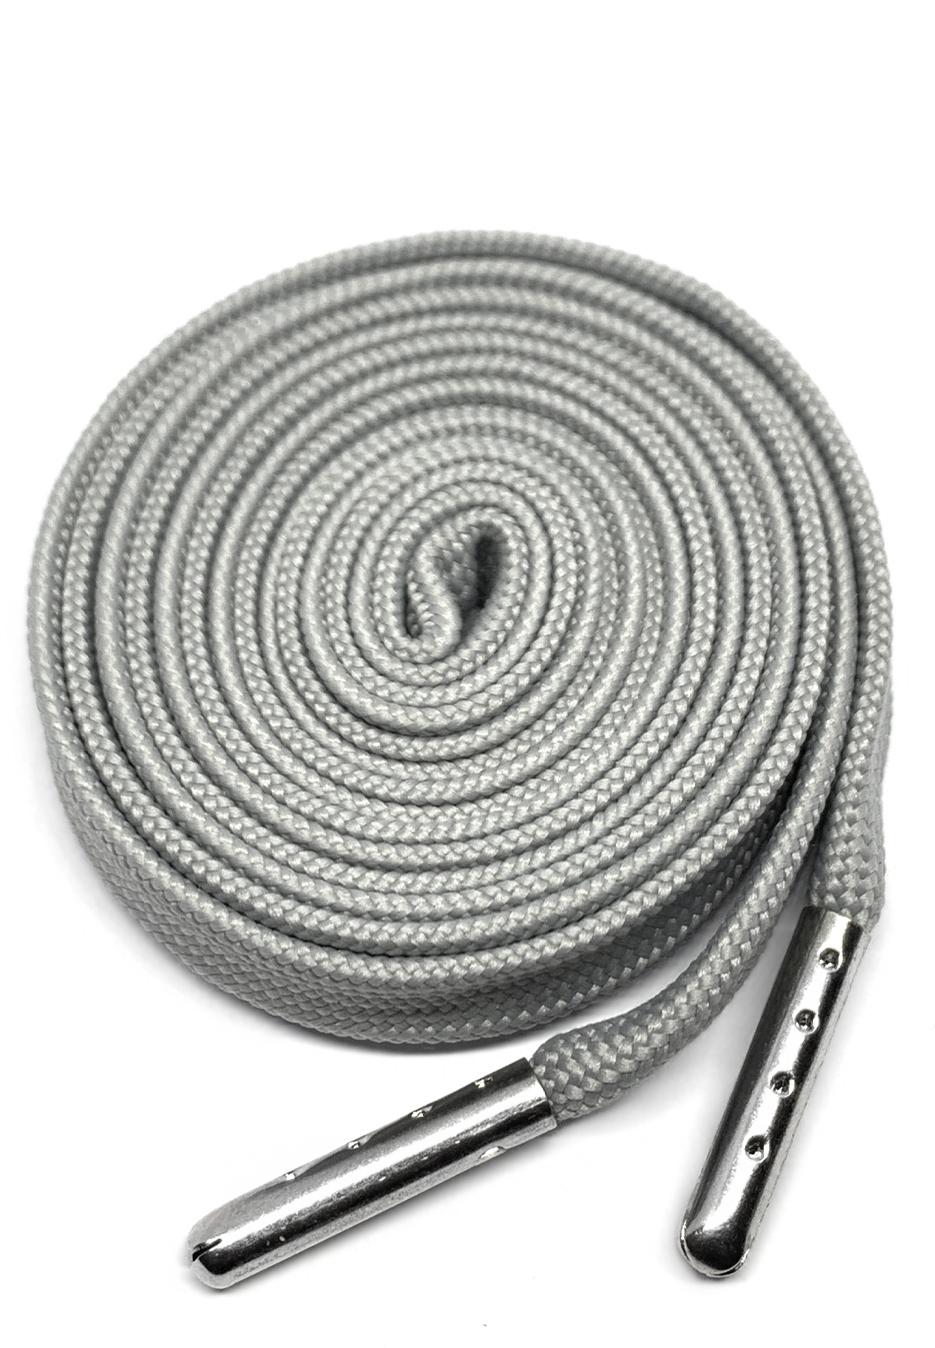 Flat metal tip shoelaces grey 1